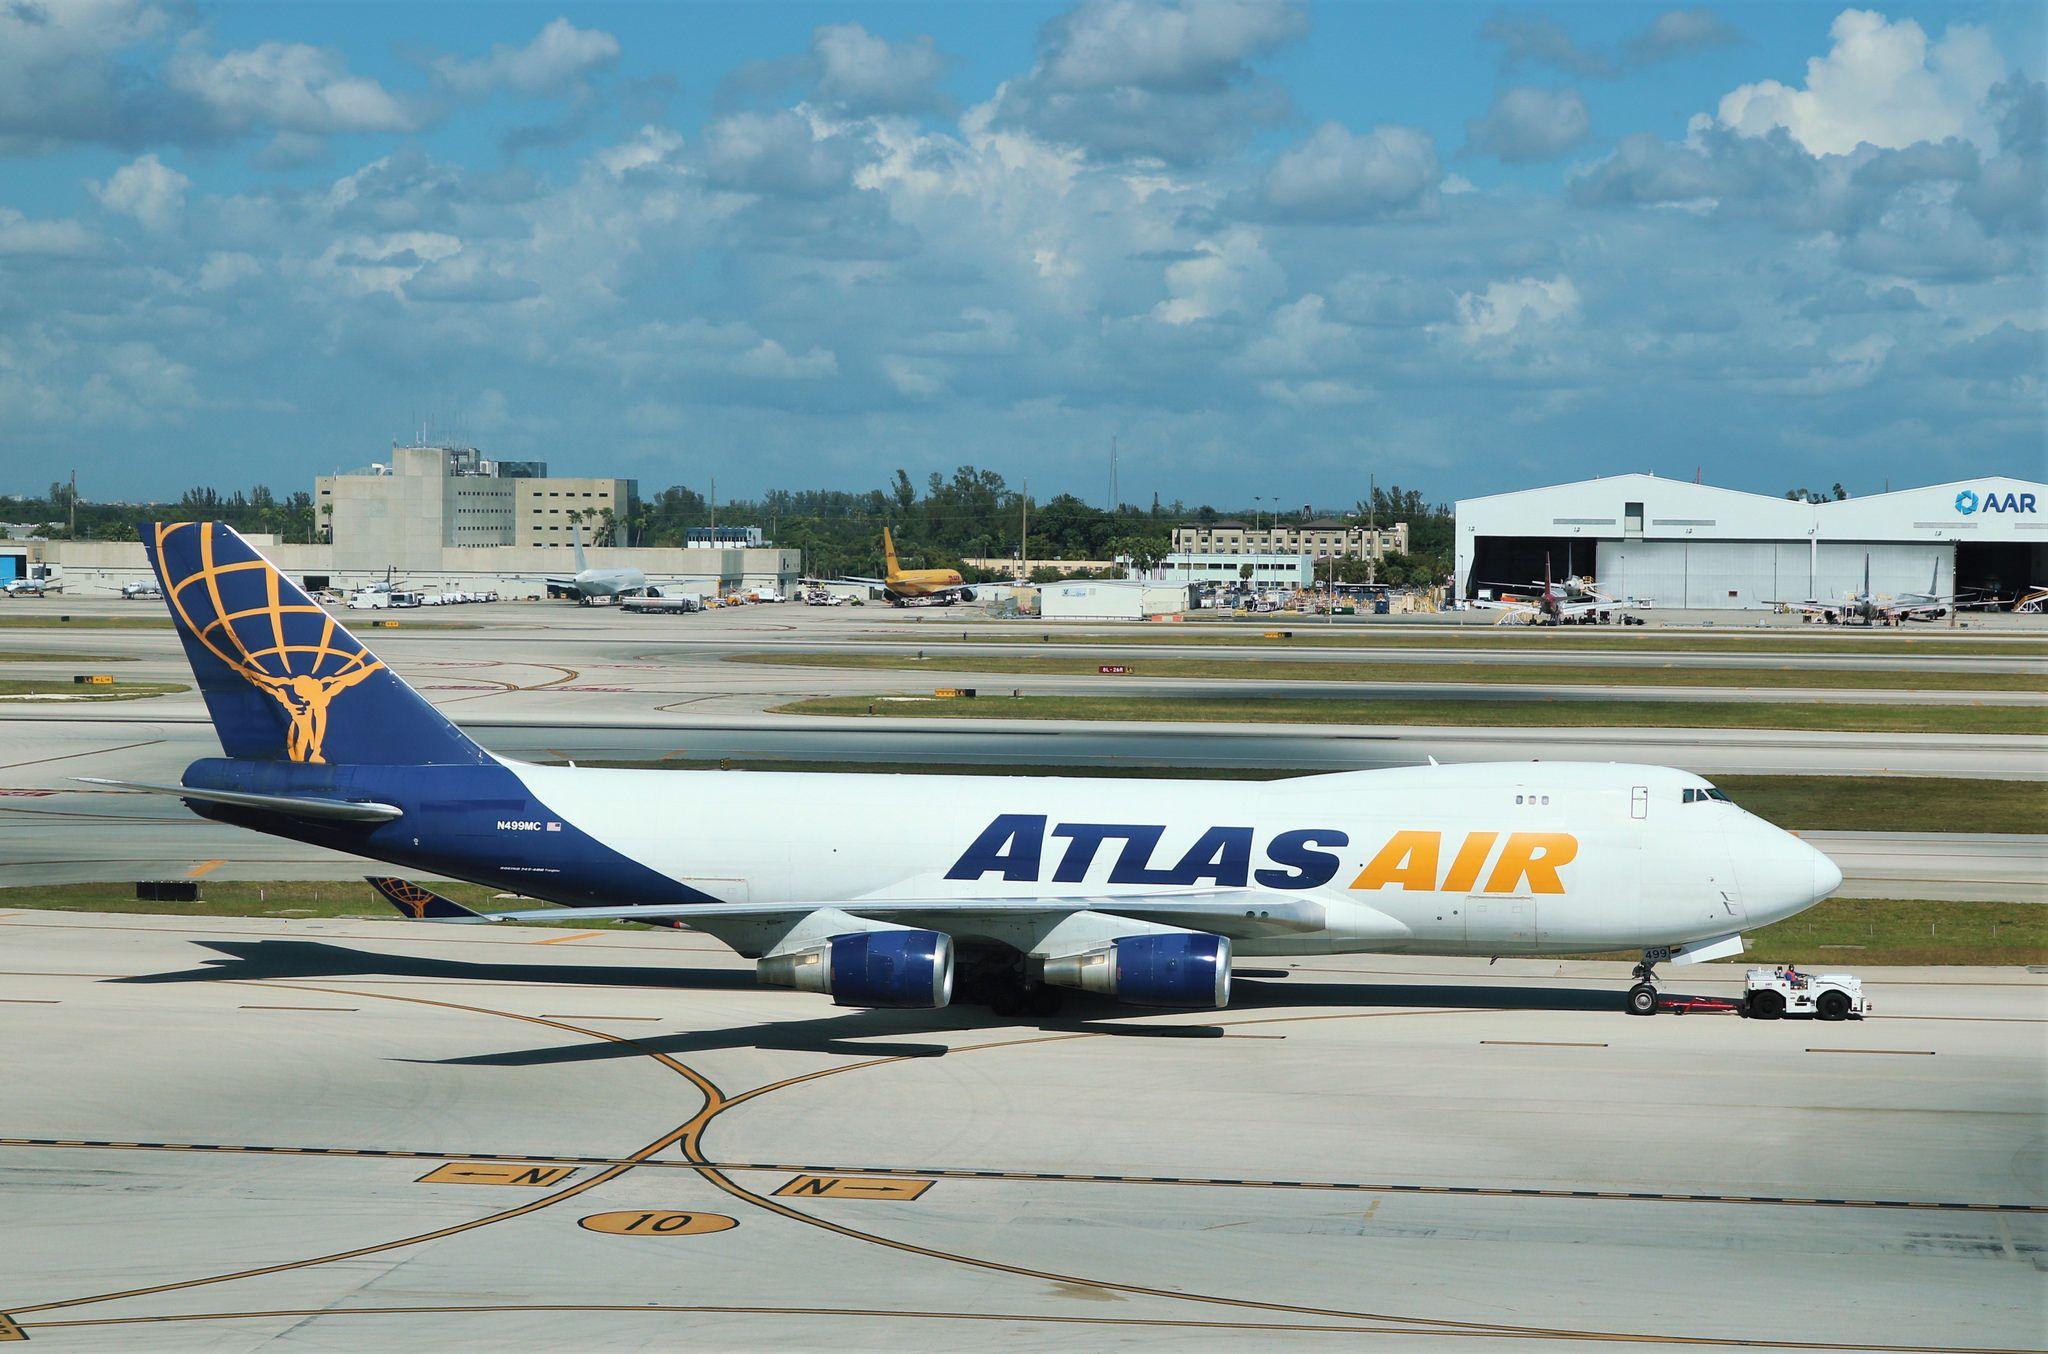 Atlas Air 747 Atlas air, Boeing aircraft, Aircraft photos